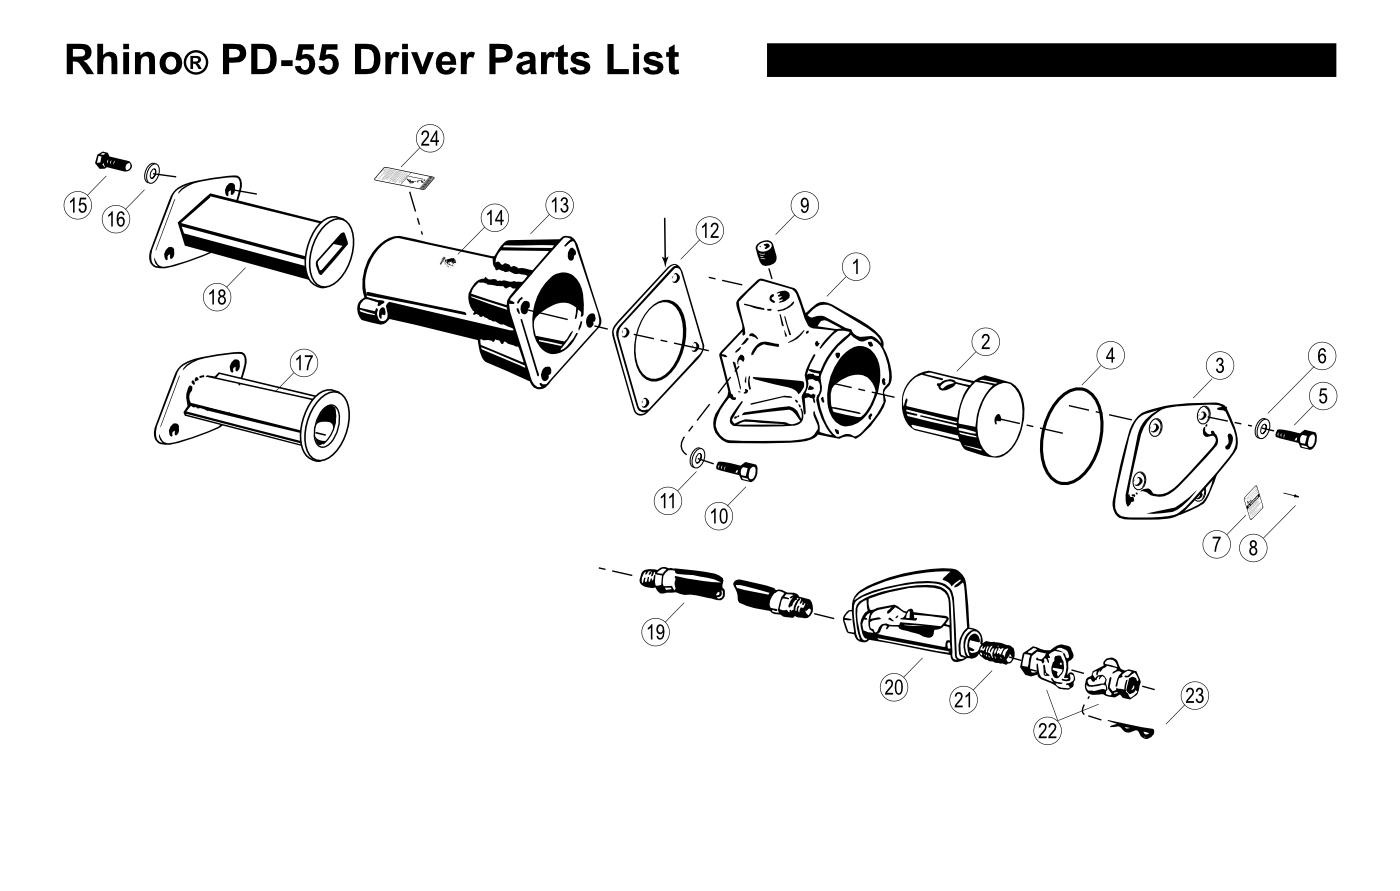 Parts for PD-55 MEDIUM DUTY POST DRIVER